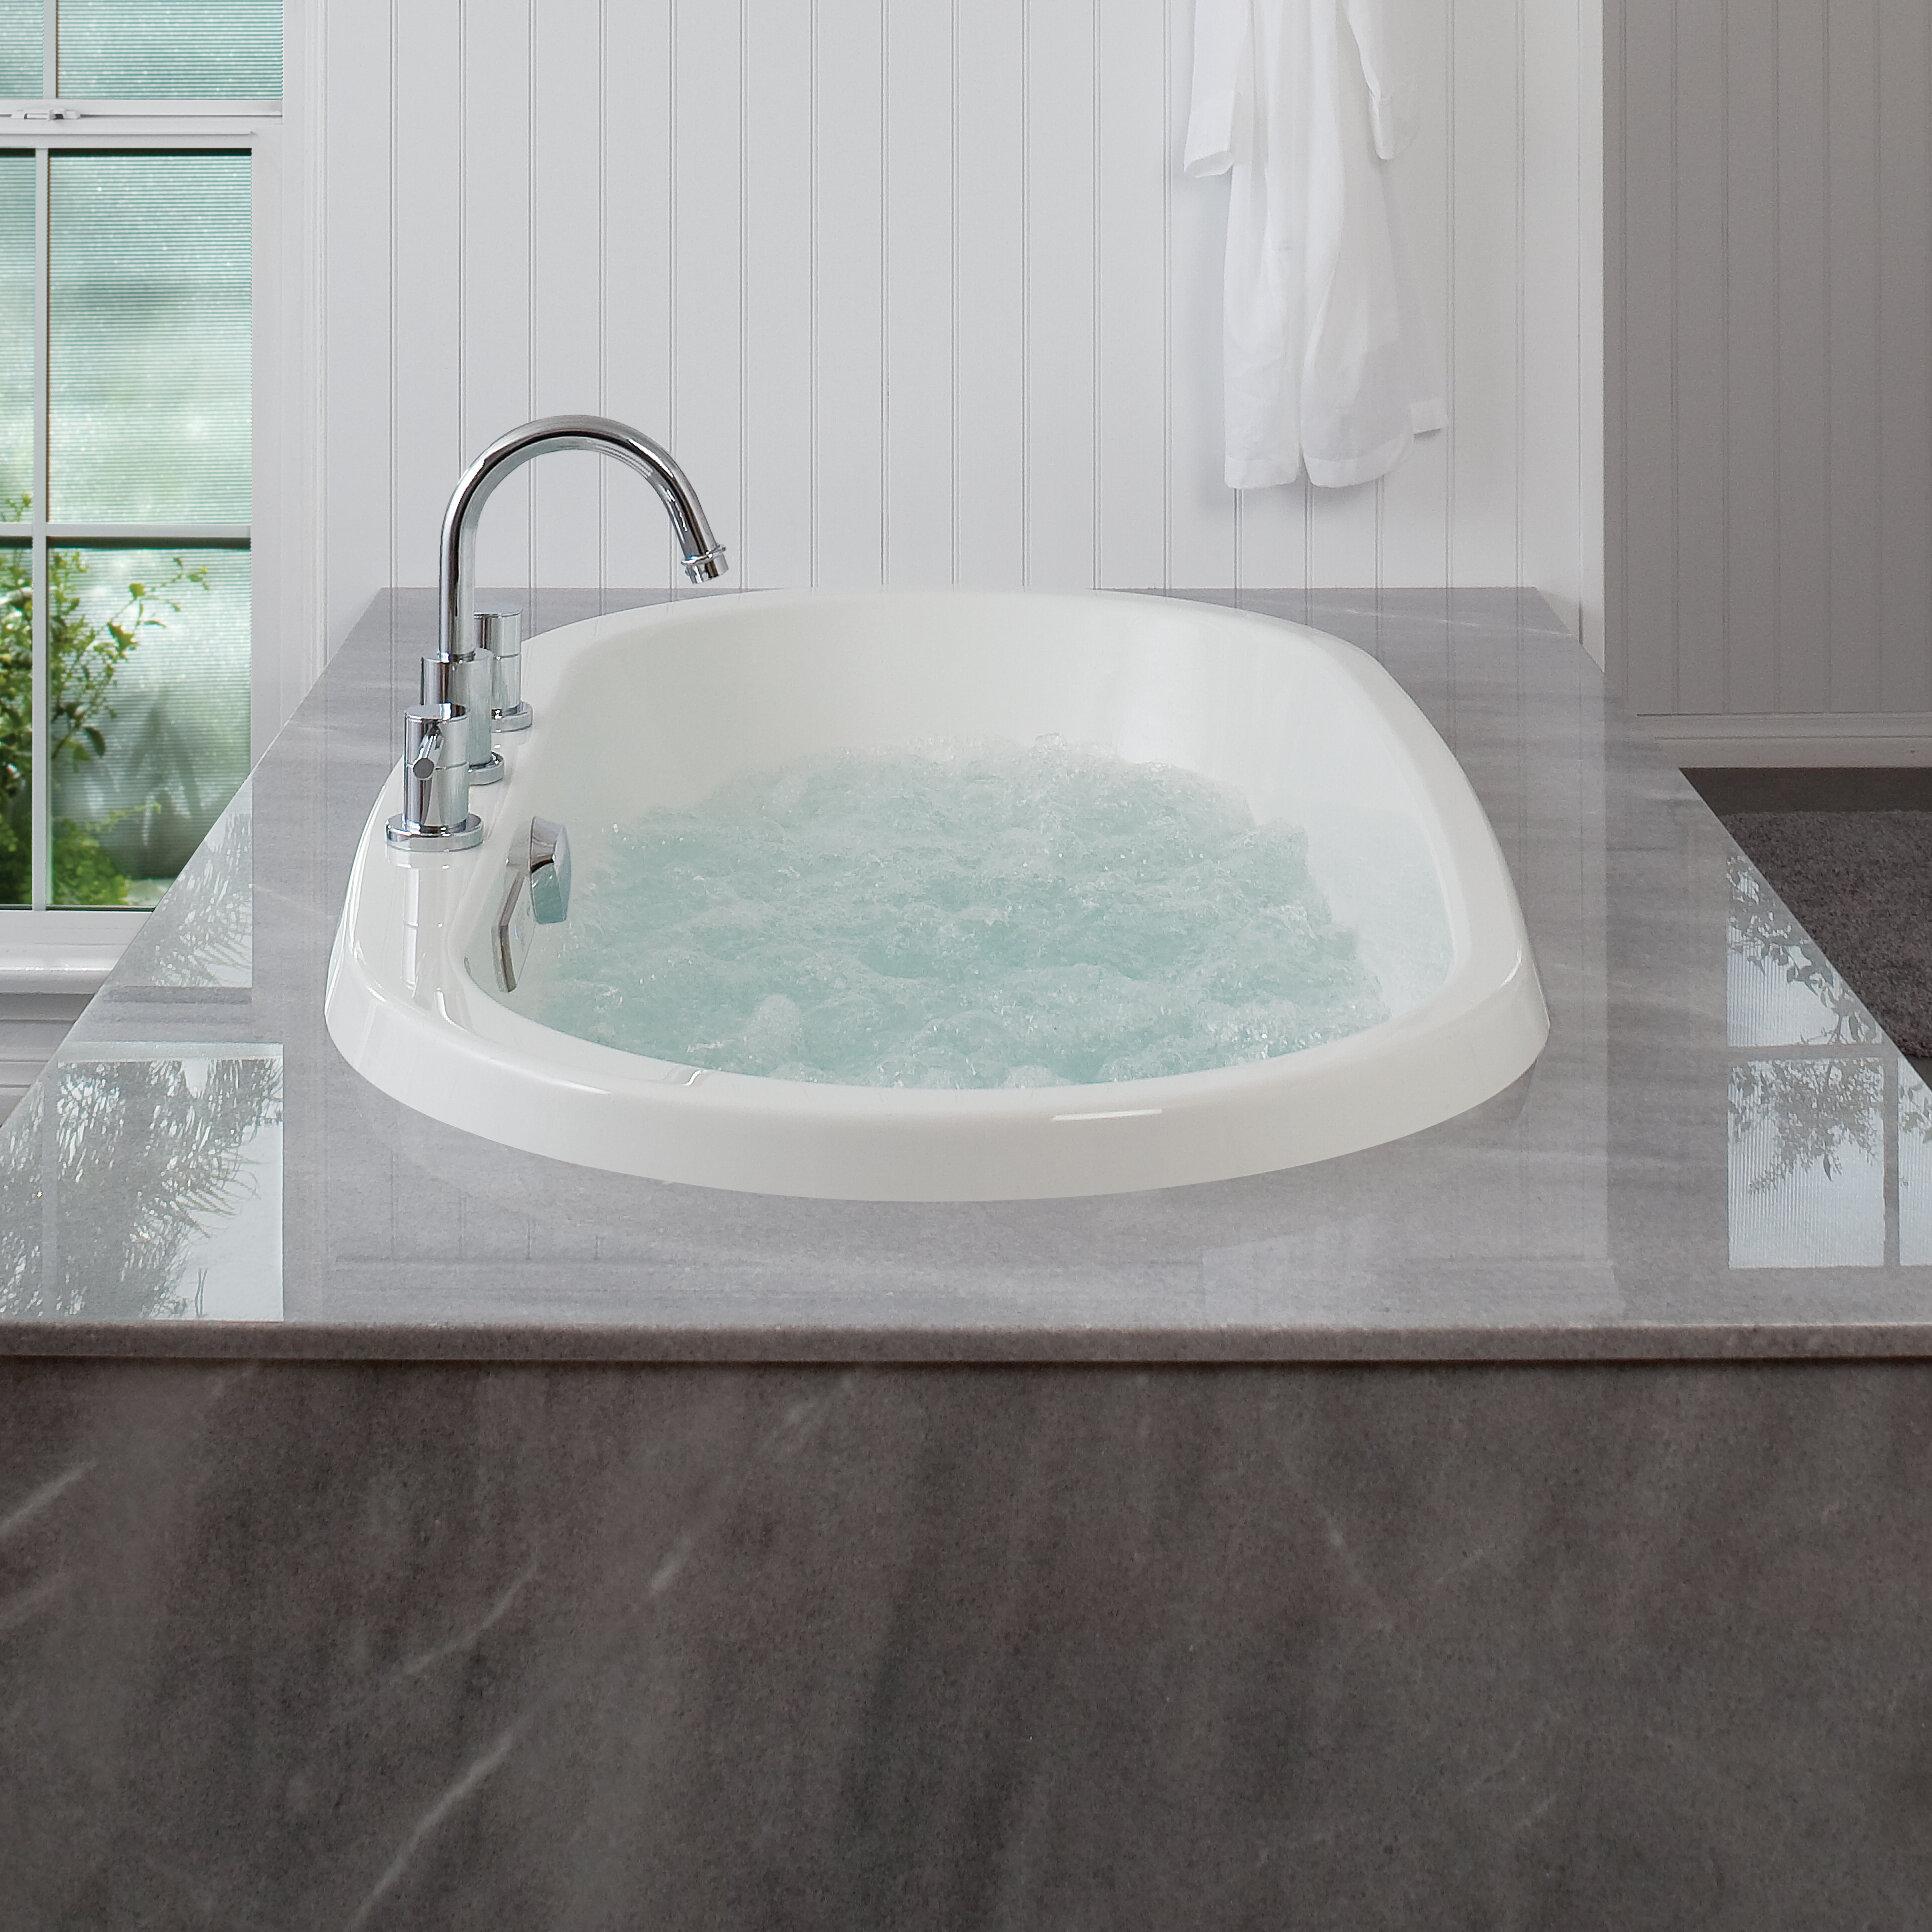 Jacuzzi Mio 72 X 42 Air Whirlpool Bathtub EBay